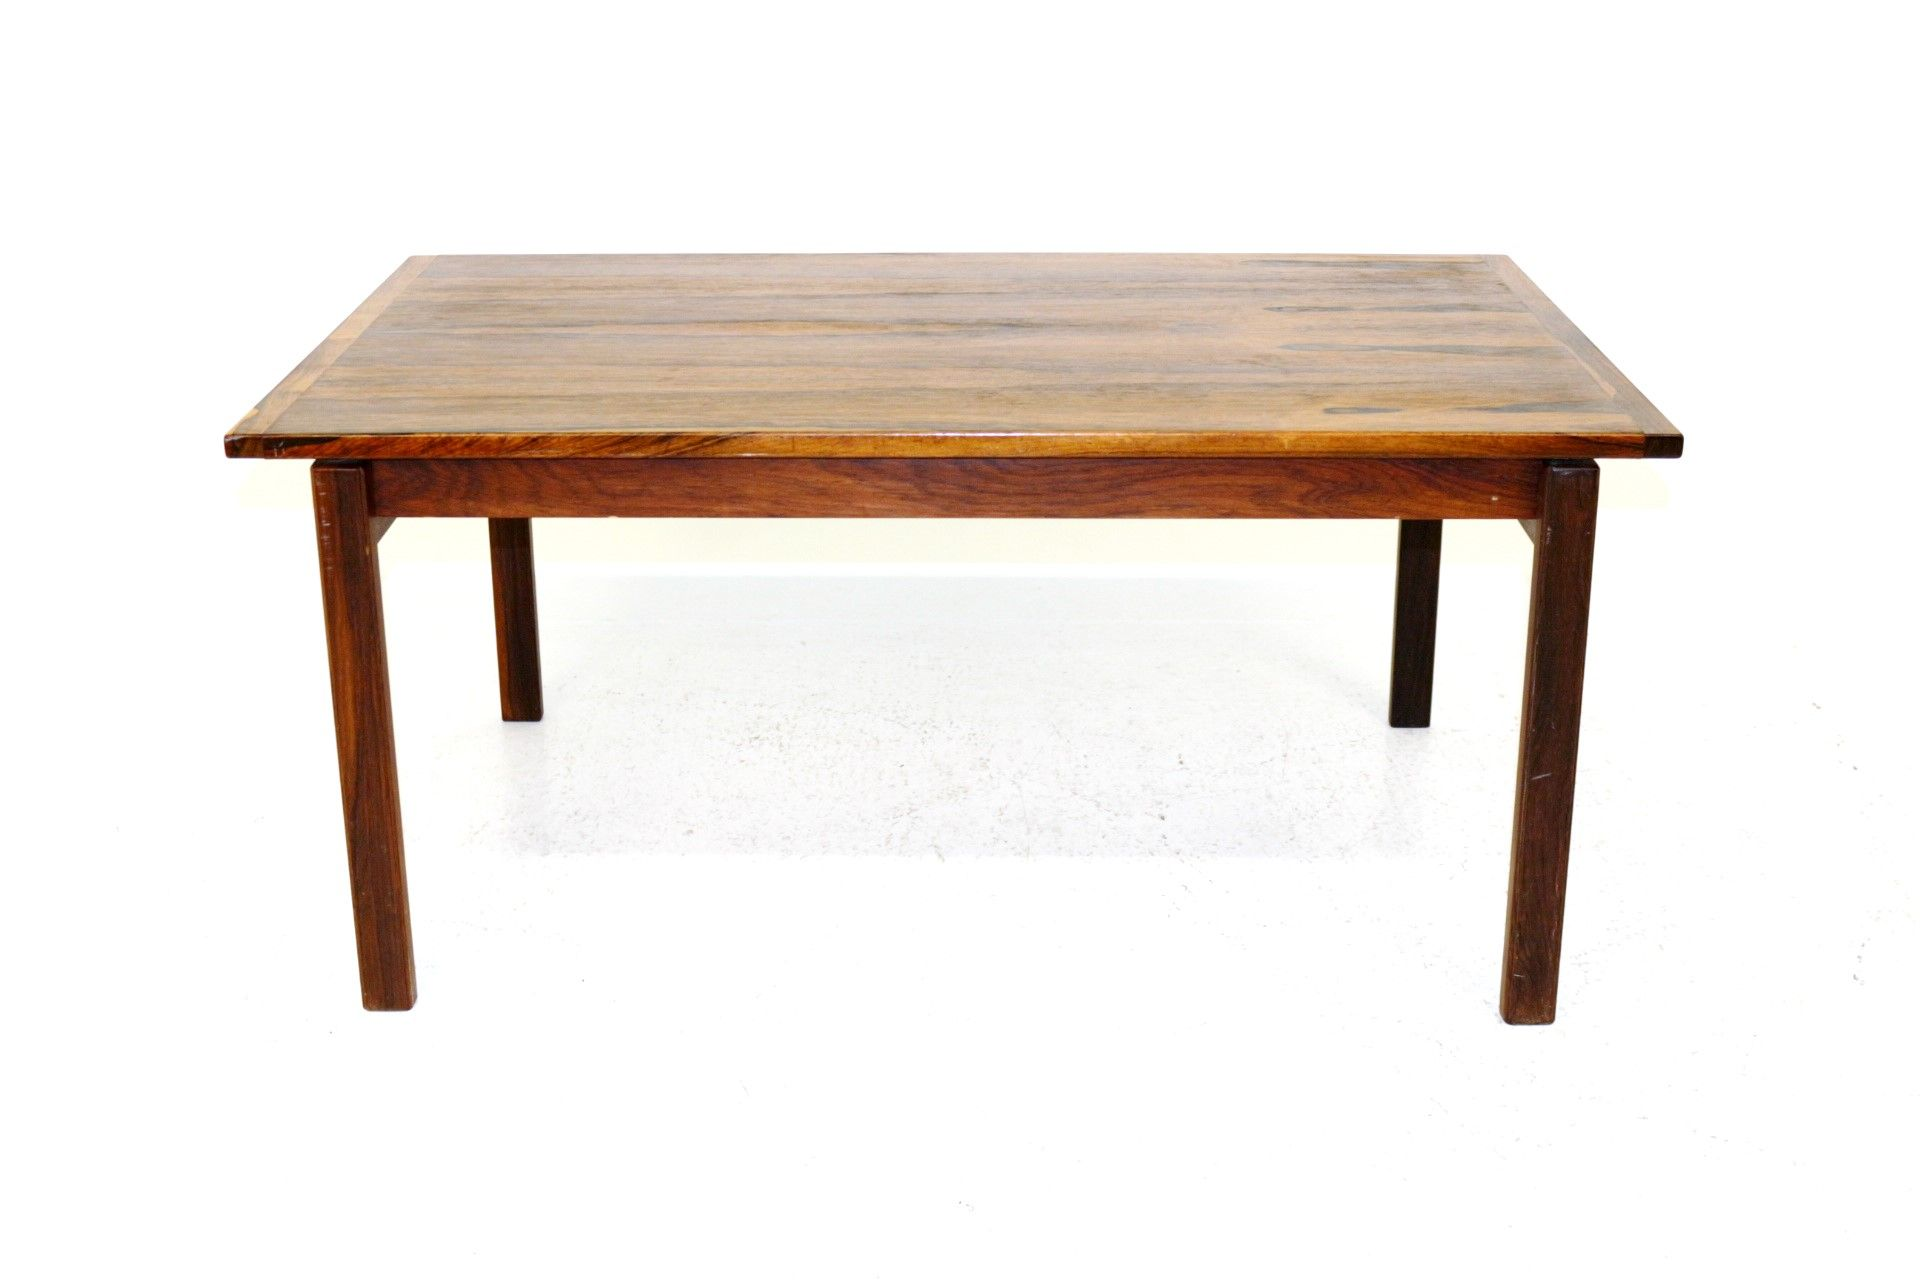 Vintage Rosewood Coffee Table Design Market